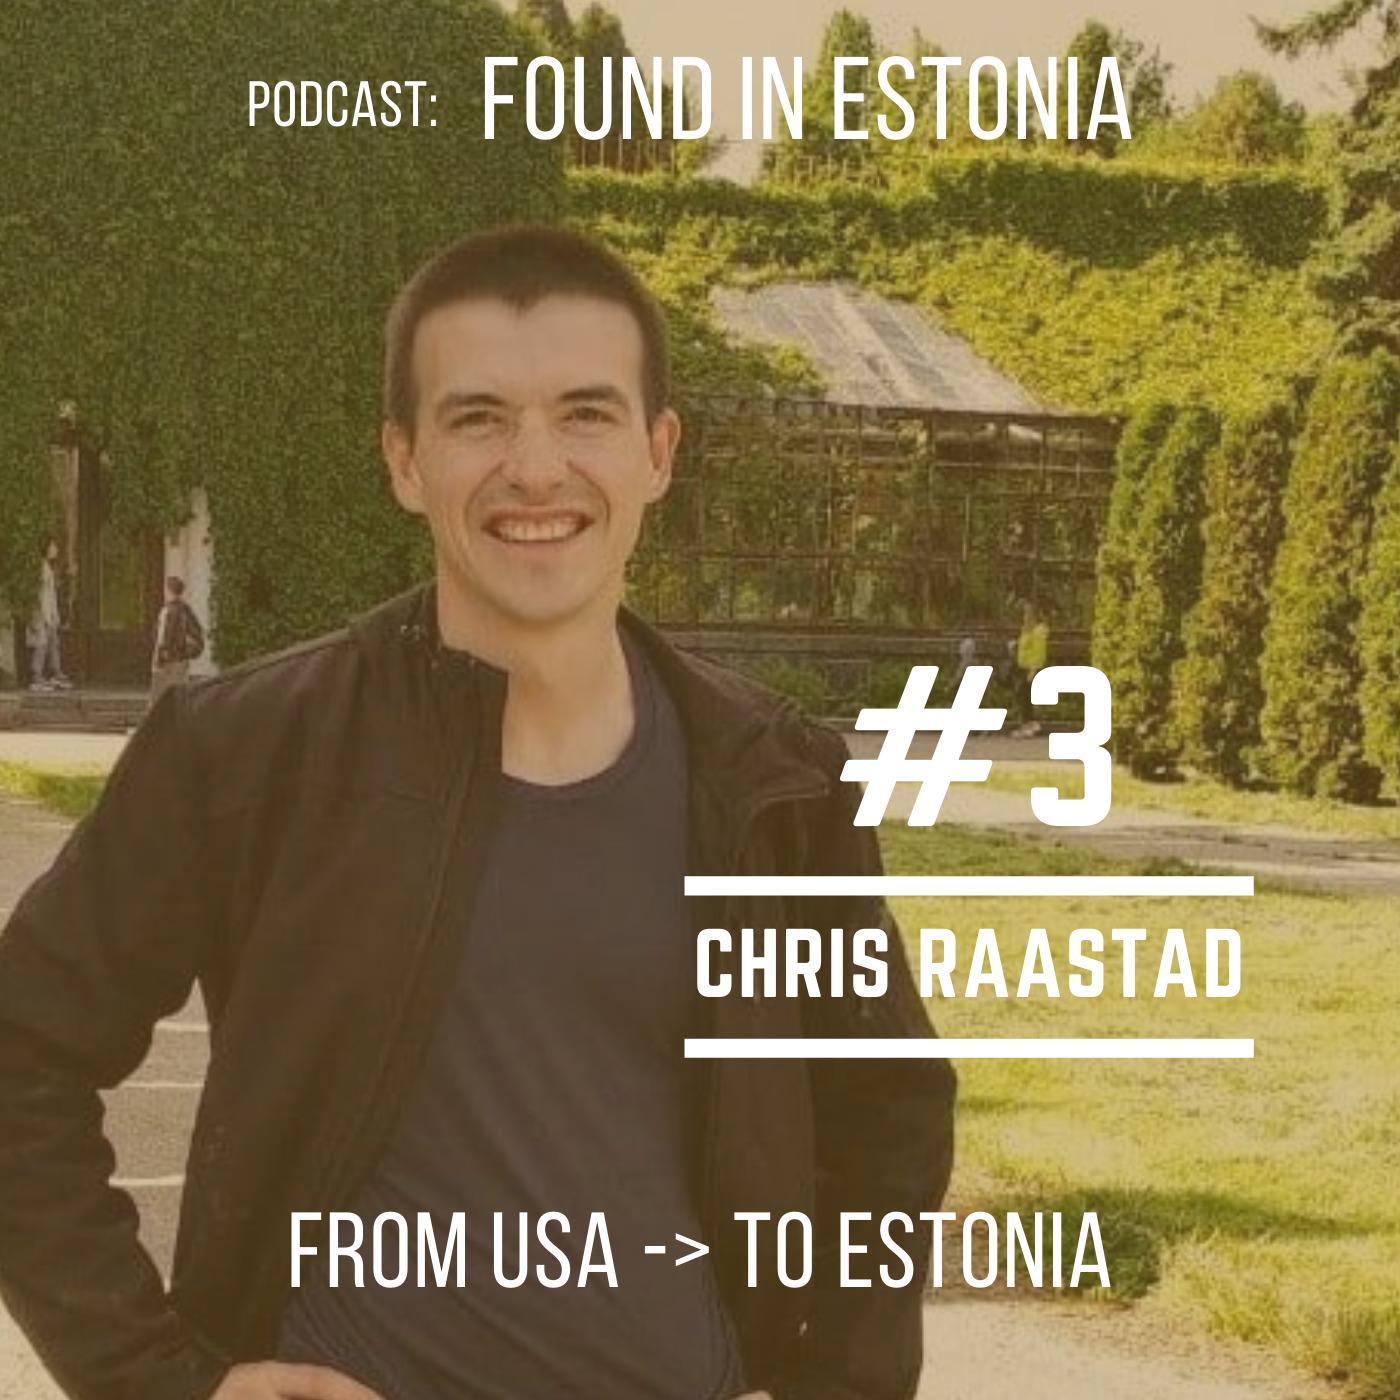 #3 from USA to Estonia - Chris Raastad